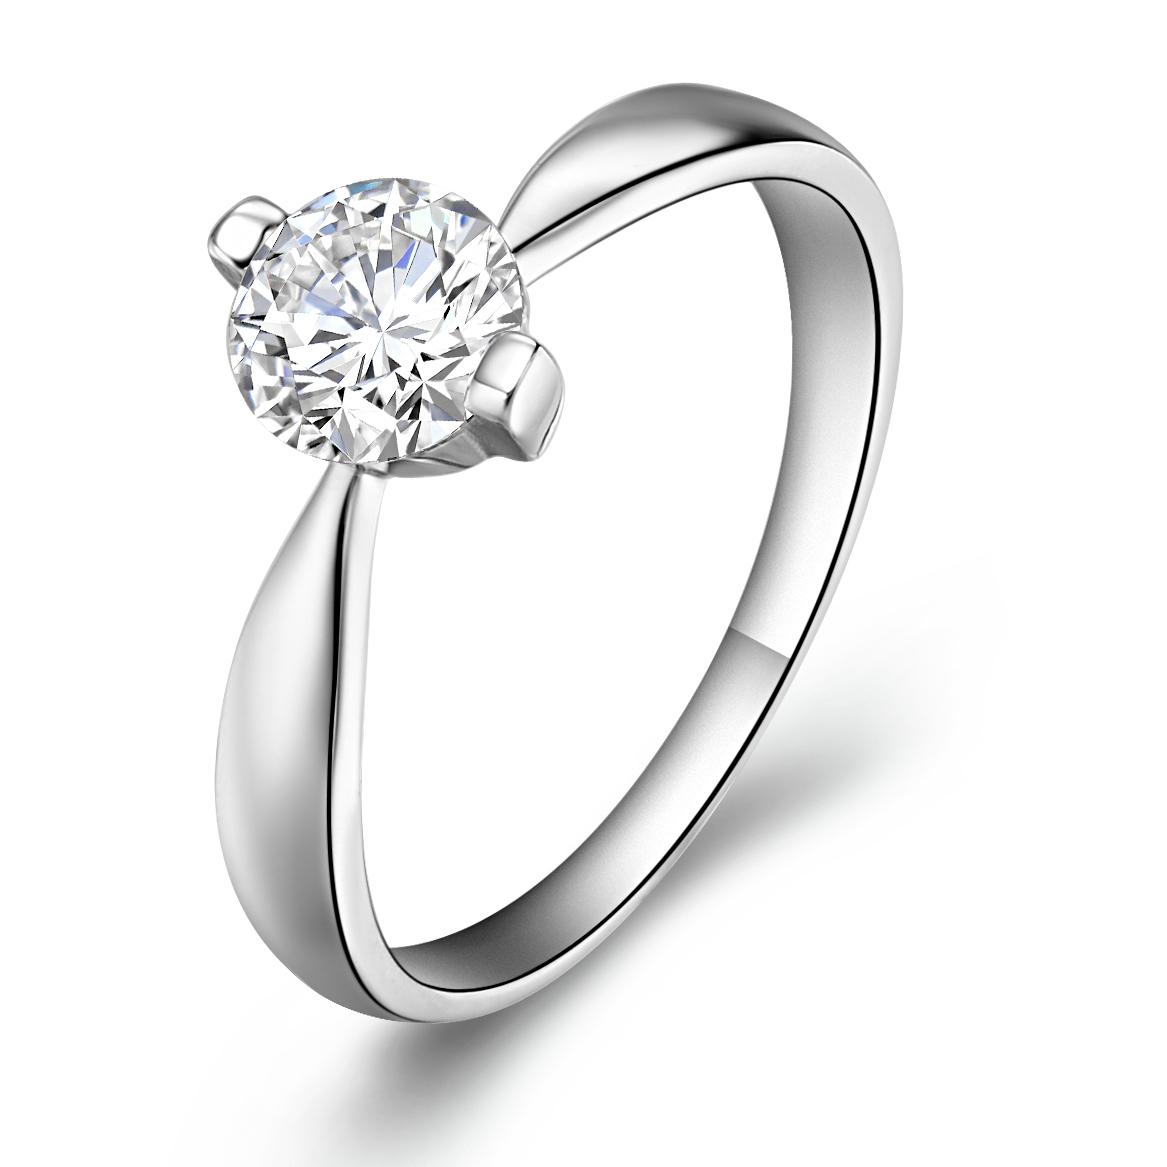 Birthday gift accessories 925 pure silver arrow cubic zircon stone ring female - Soldi Fashion Jewelry store